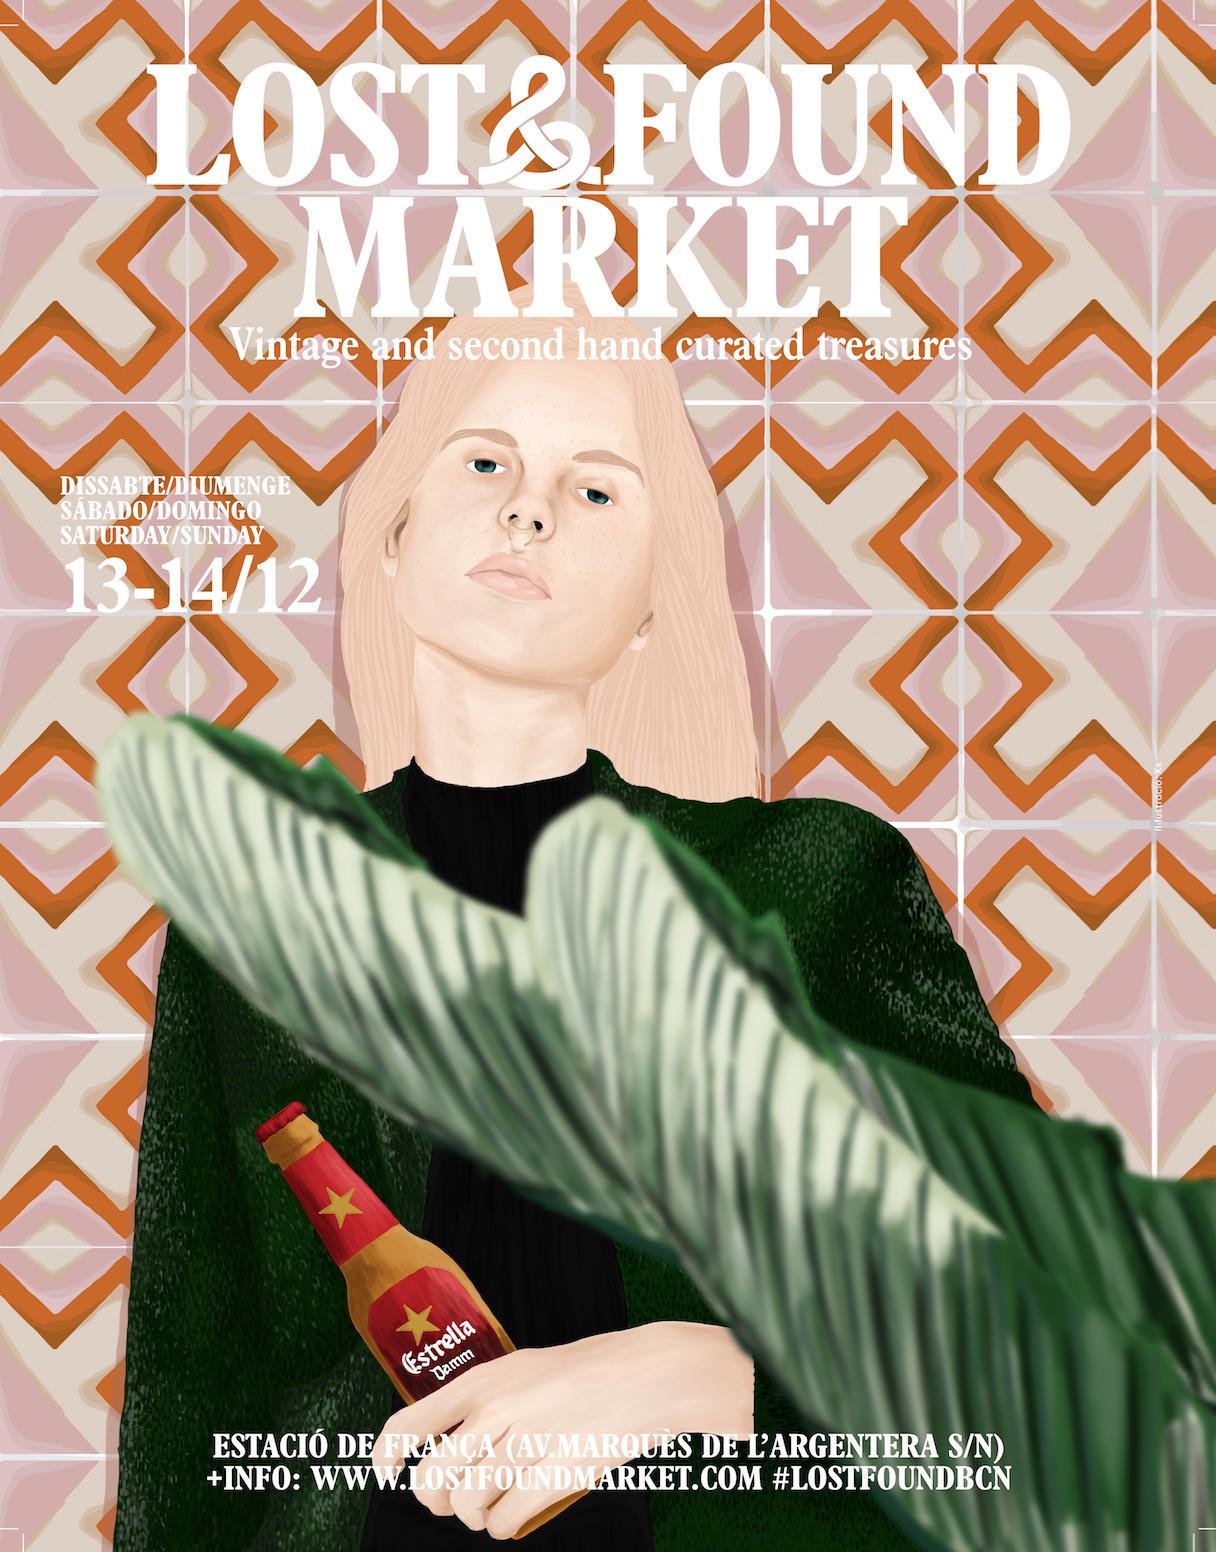 Poster Lost Market, vintage mar - stefaniatejada | ello